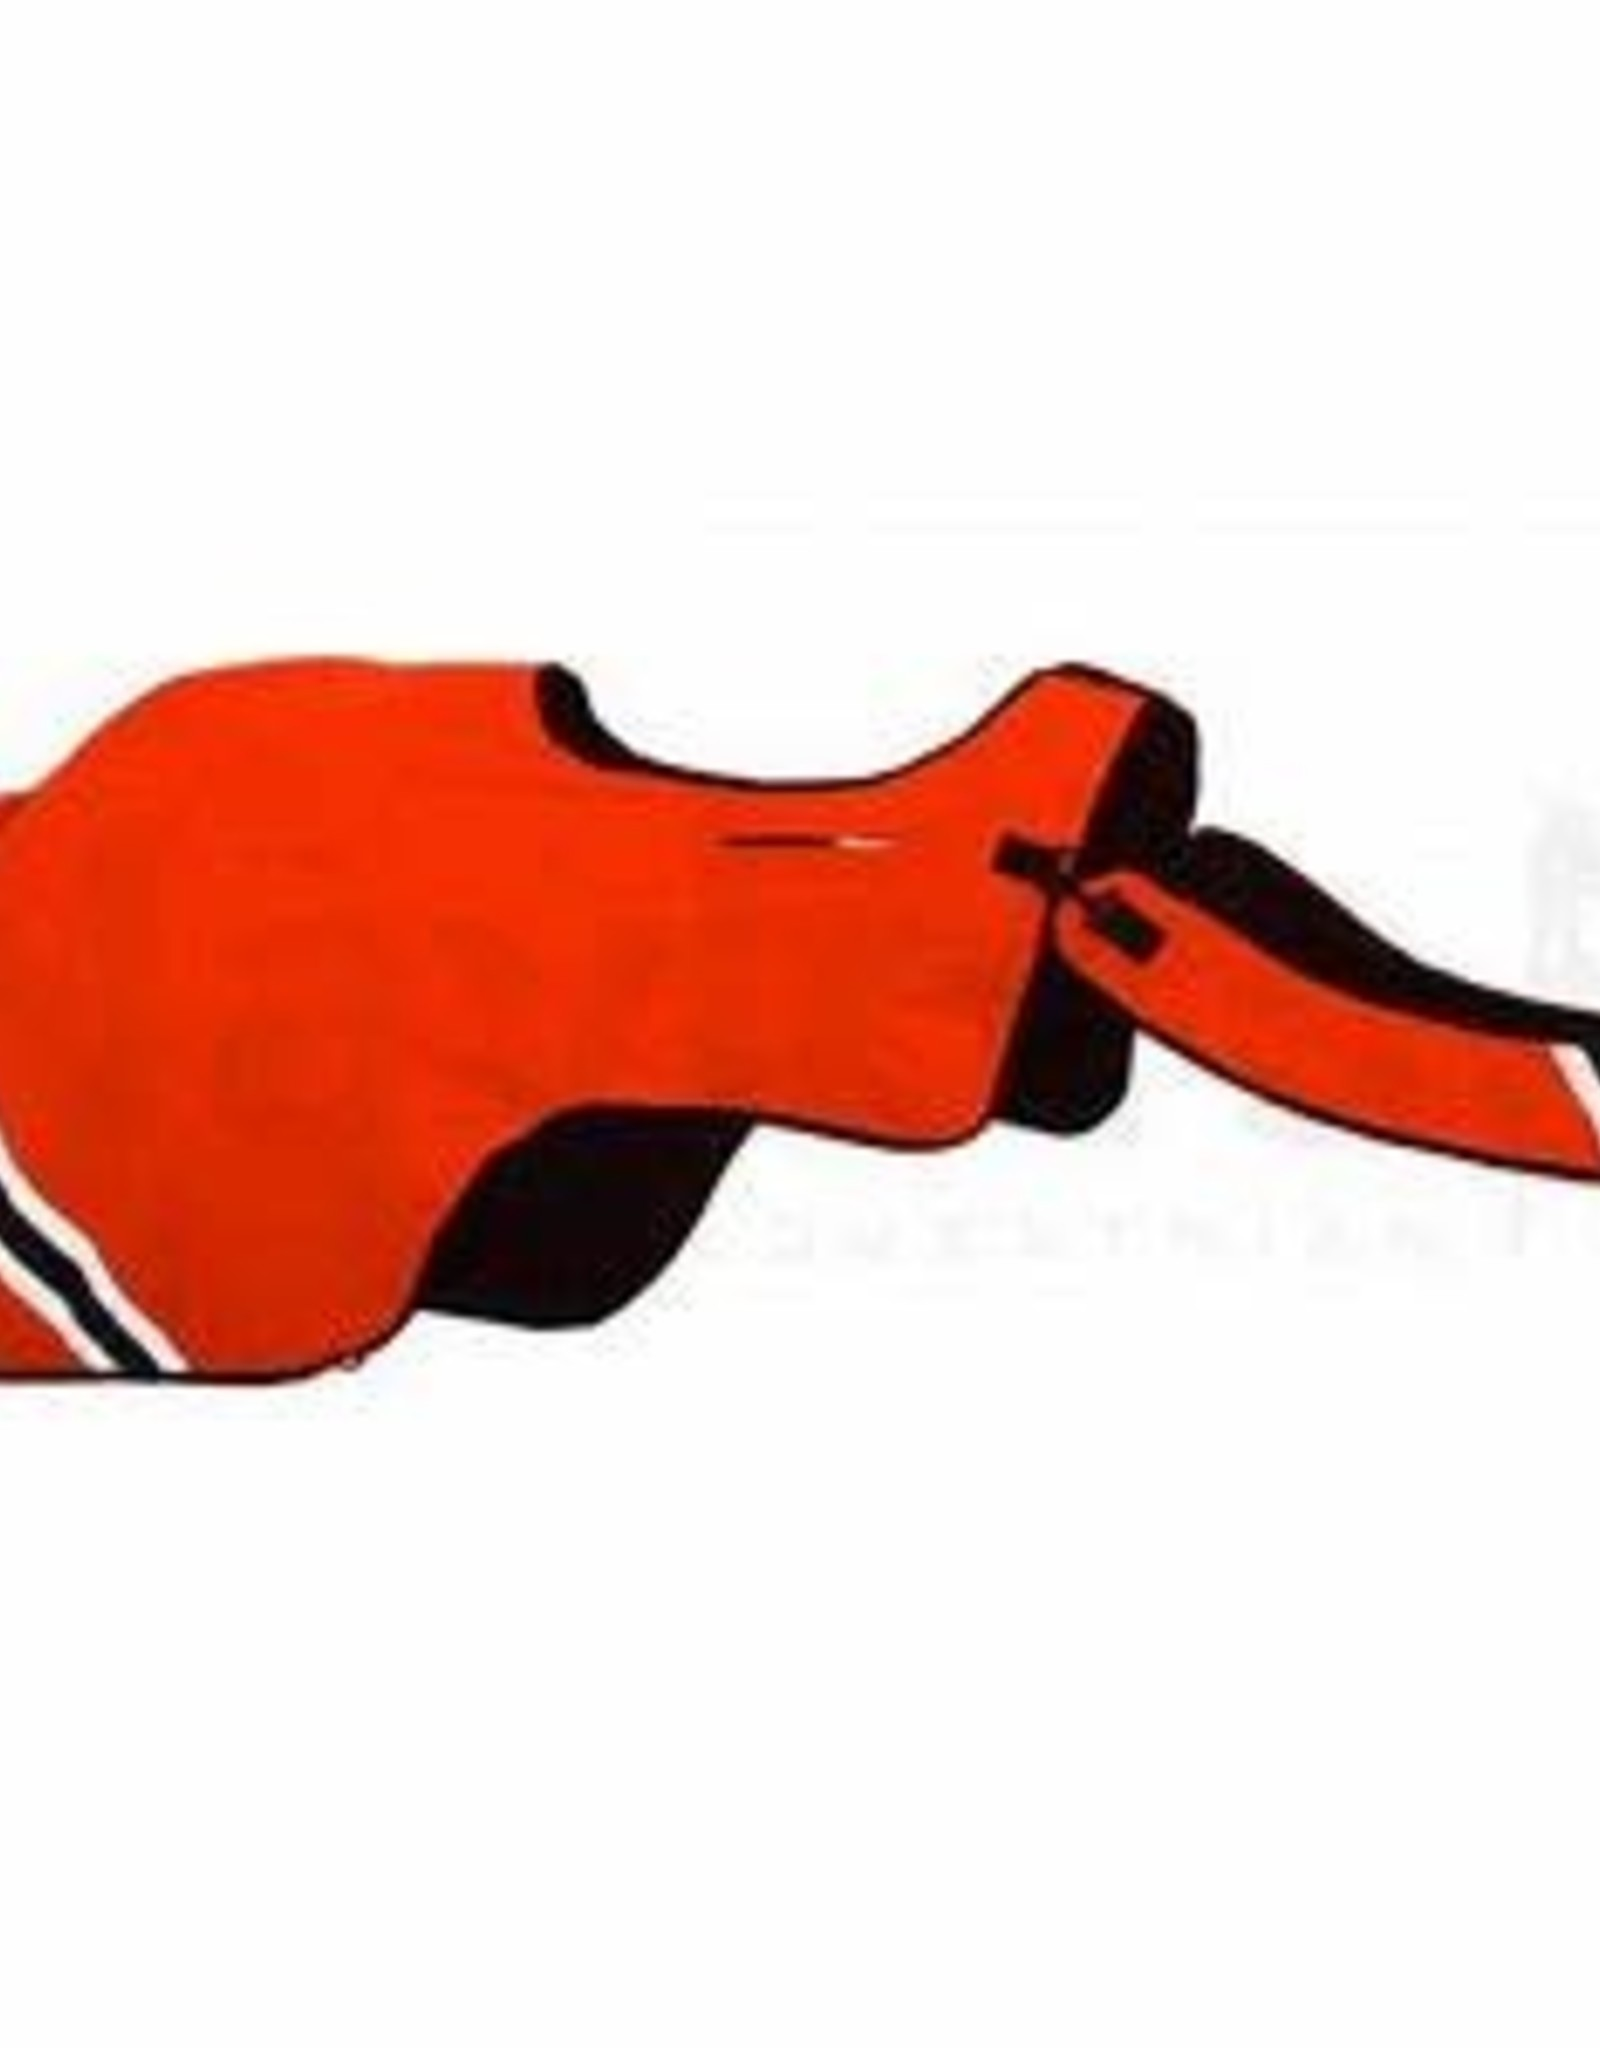 EQUISAFETY WINTER WRAPAROUND RUG RED ORANGE WARMBLOOD